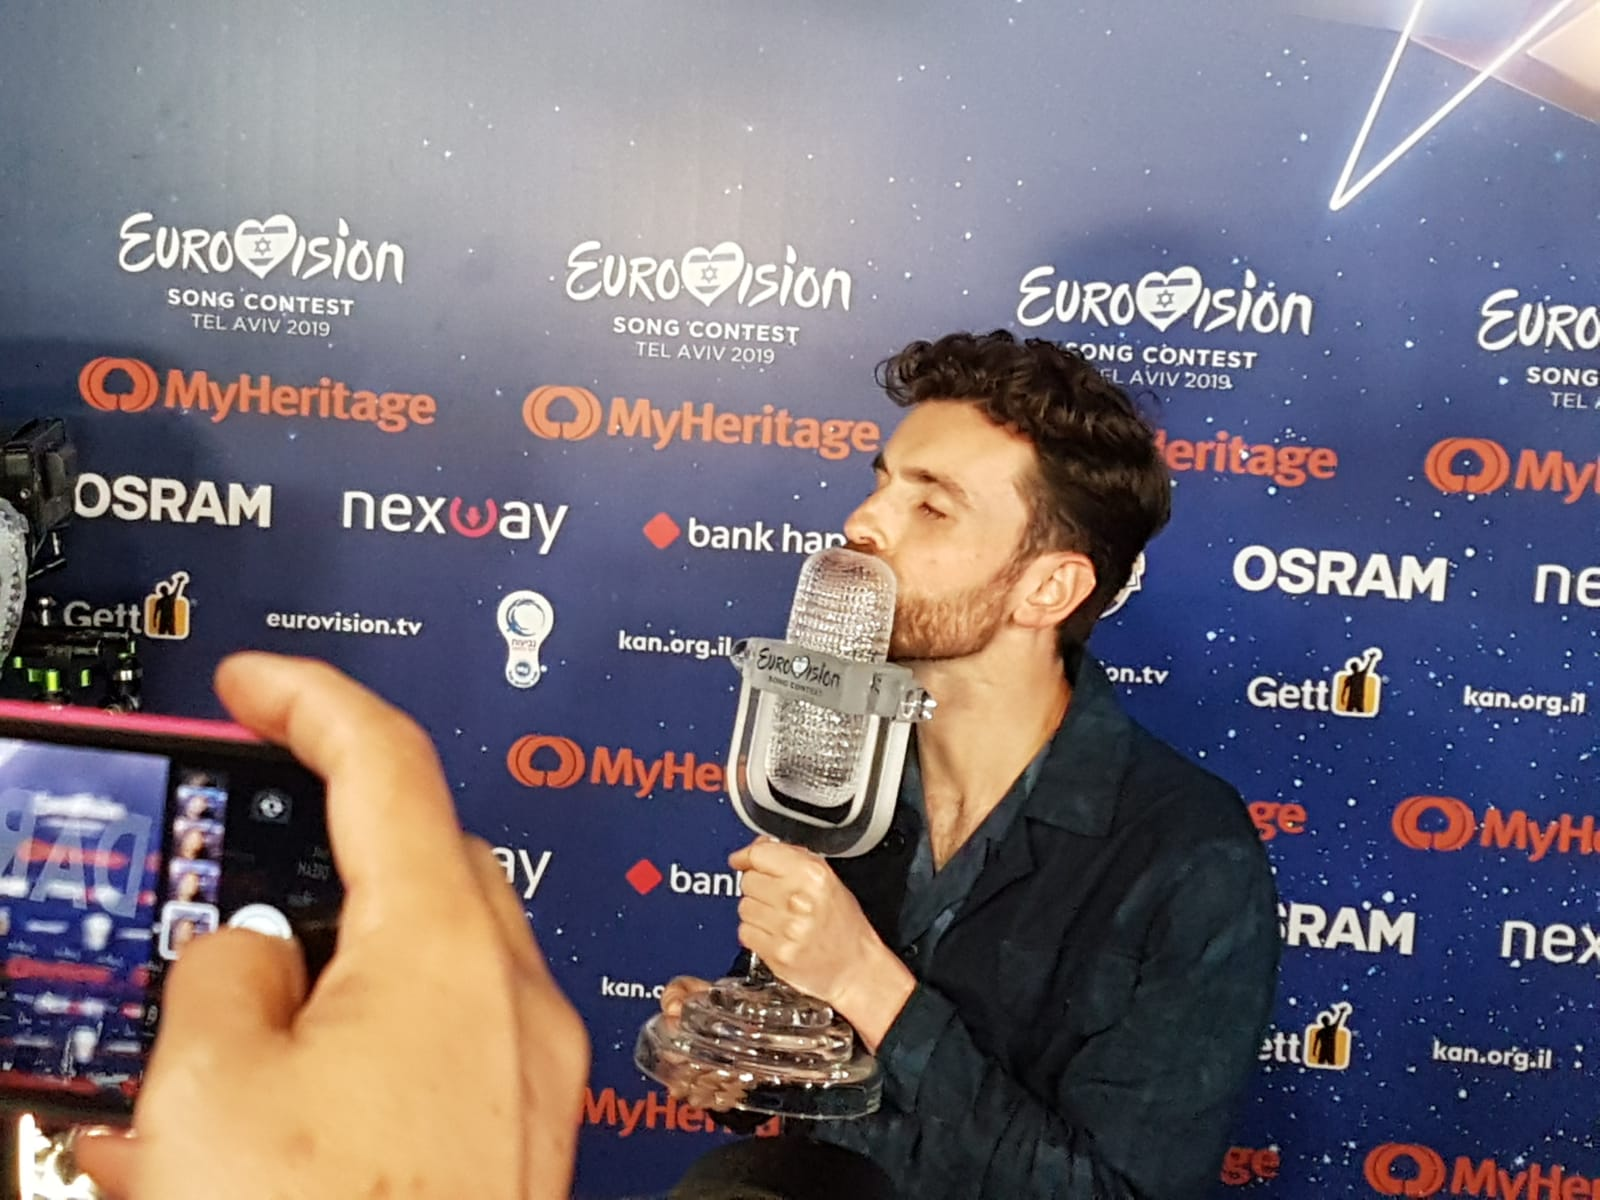 Eurovize 2019